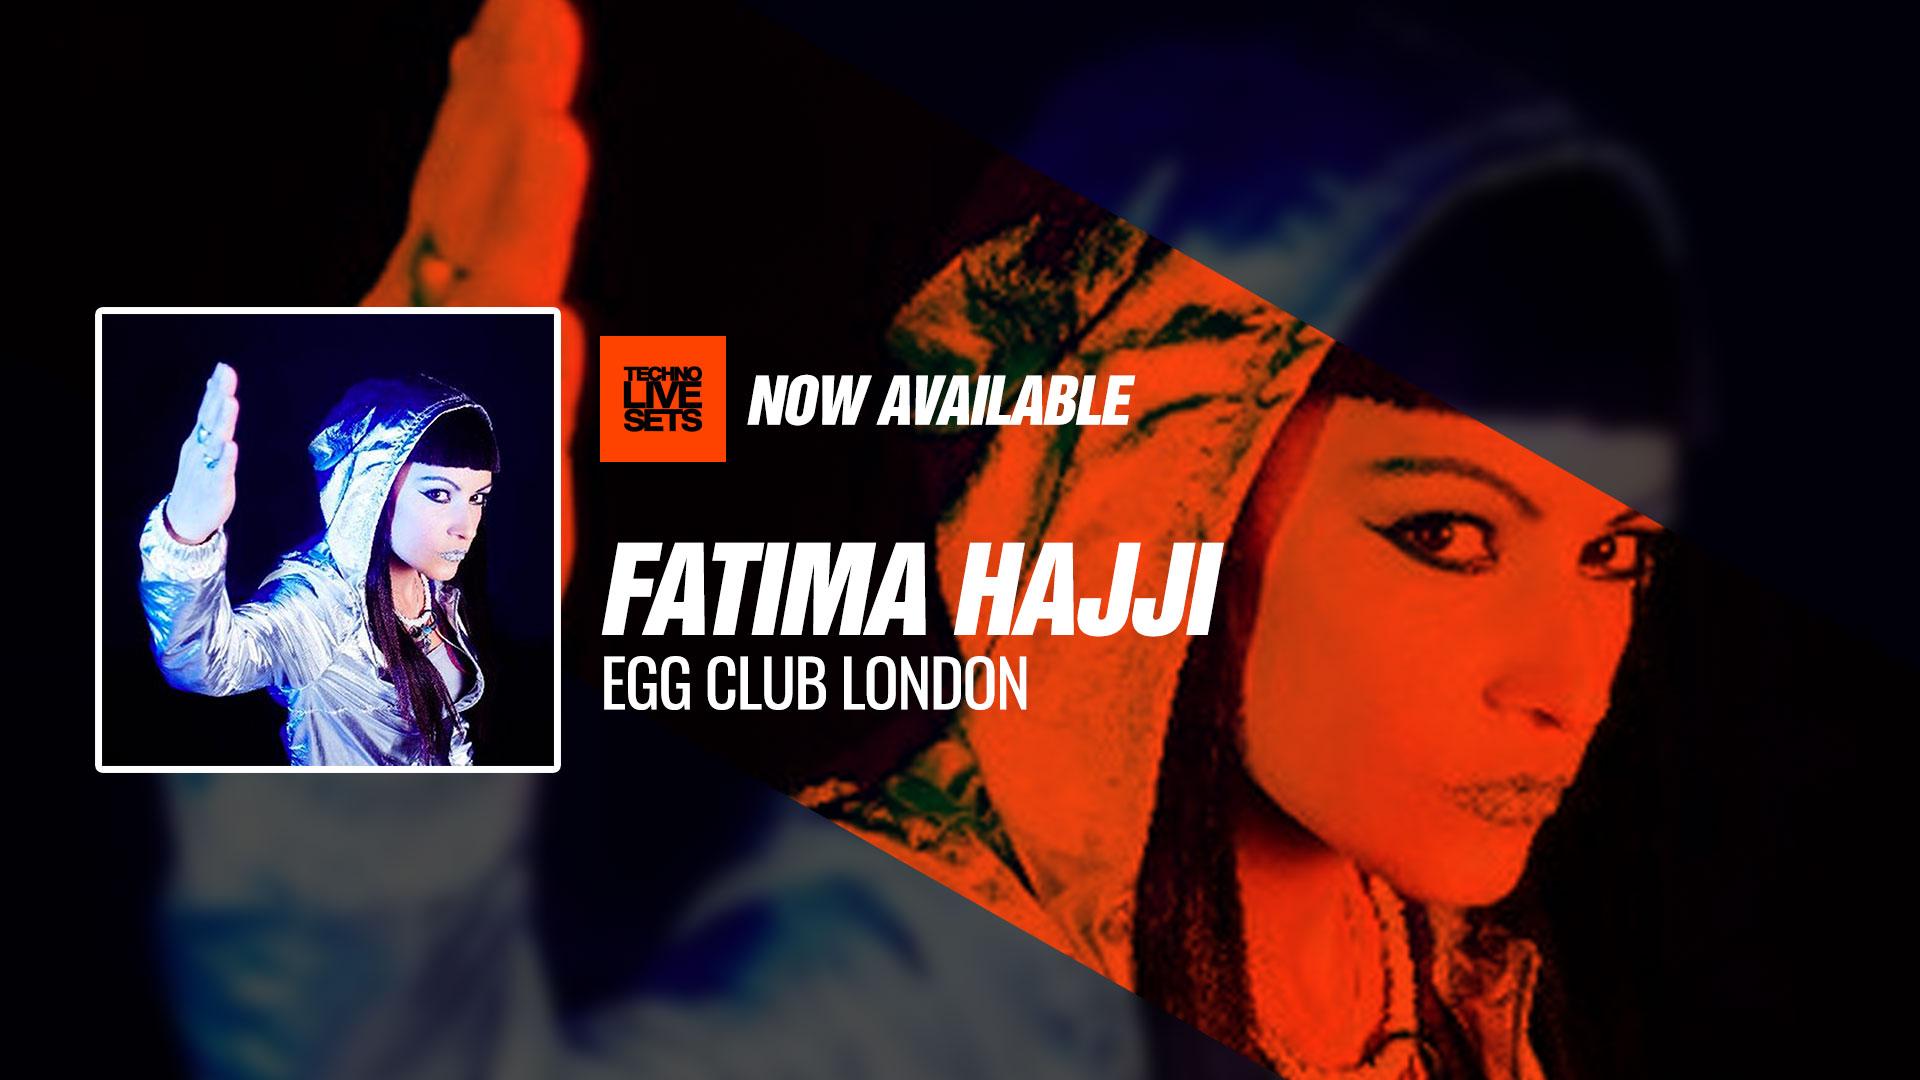 Fatima Hajji 2018 EGG Club London 03-03-2018